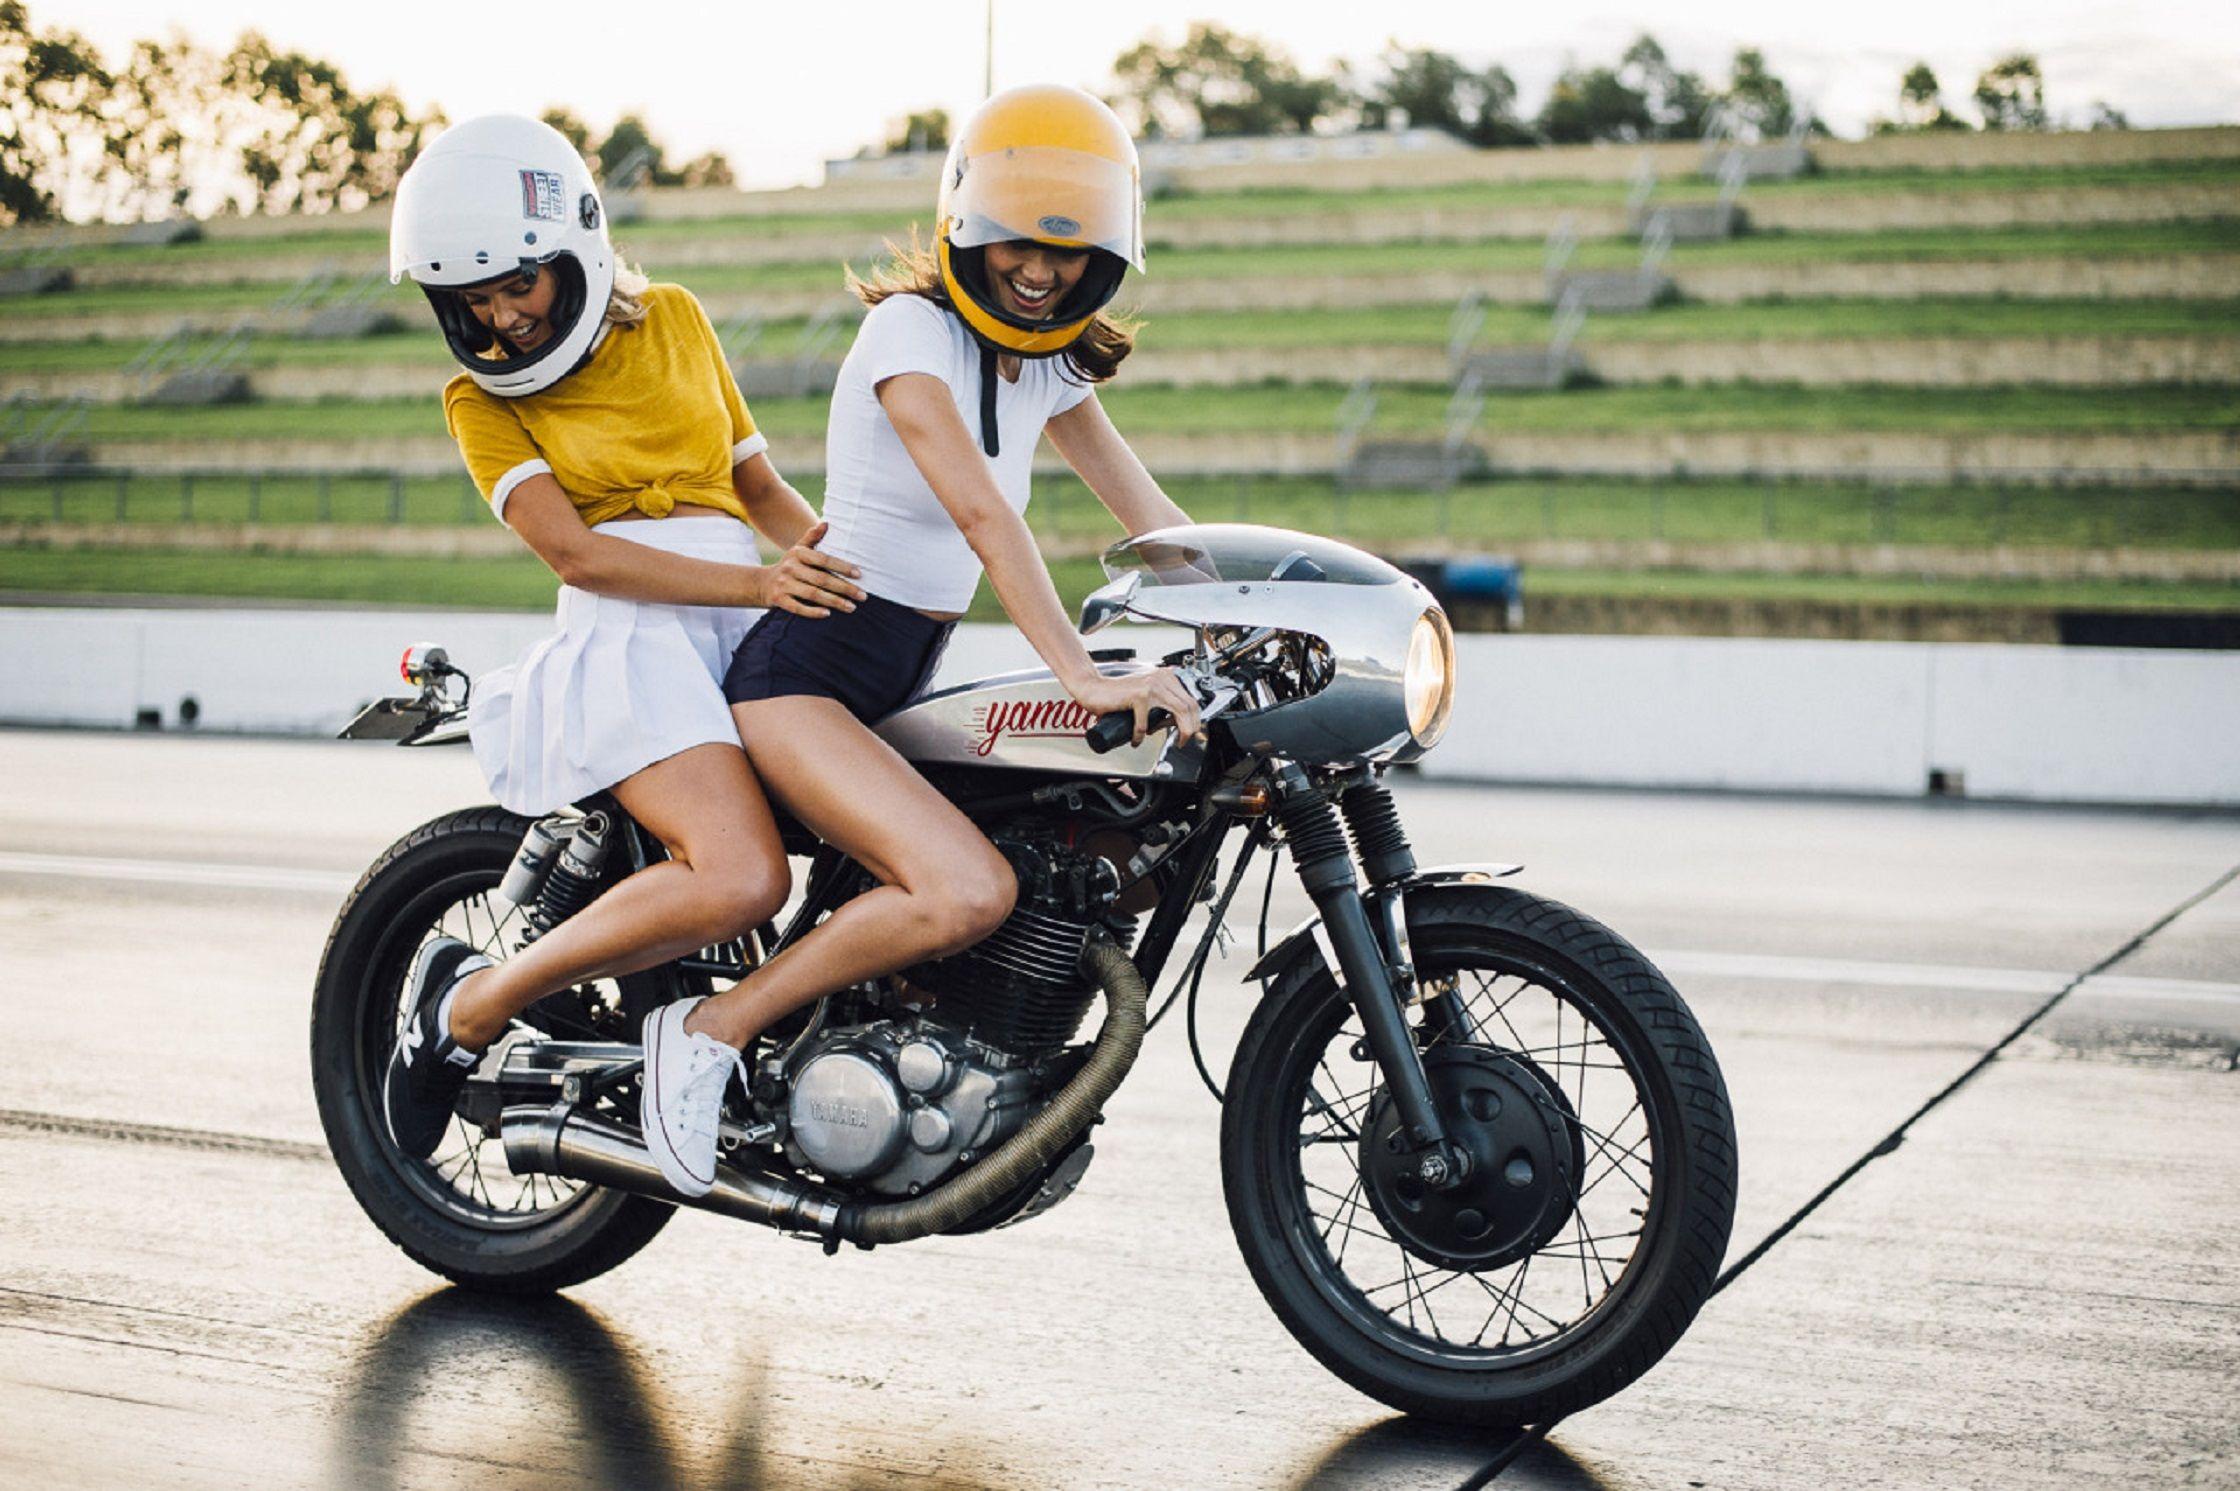 two up on a tidy yamaha sr400 café racer custom. http://mulpix